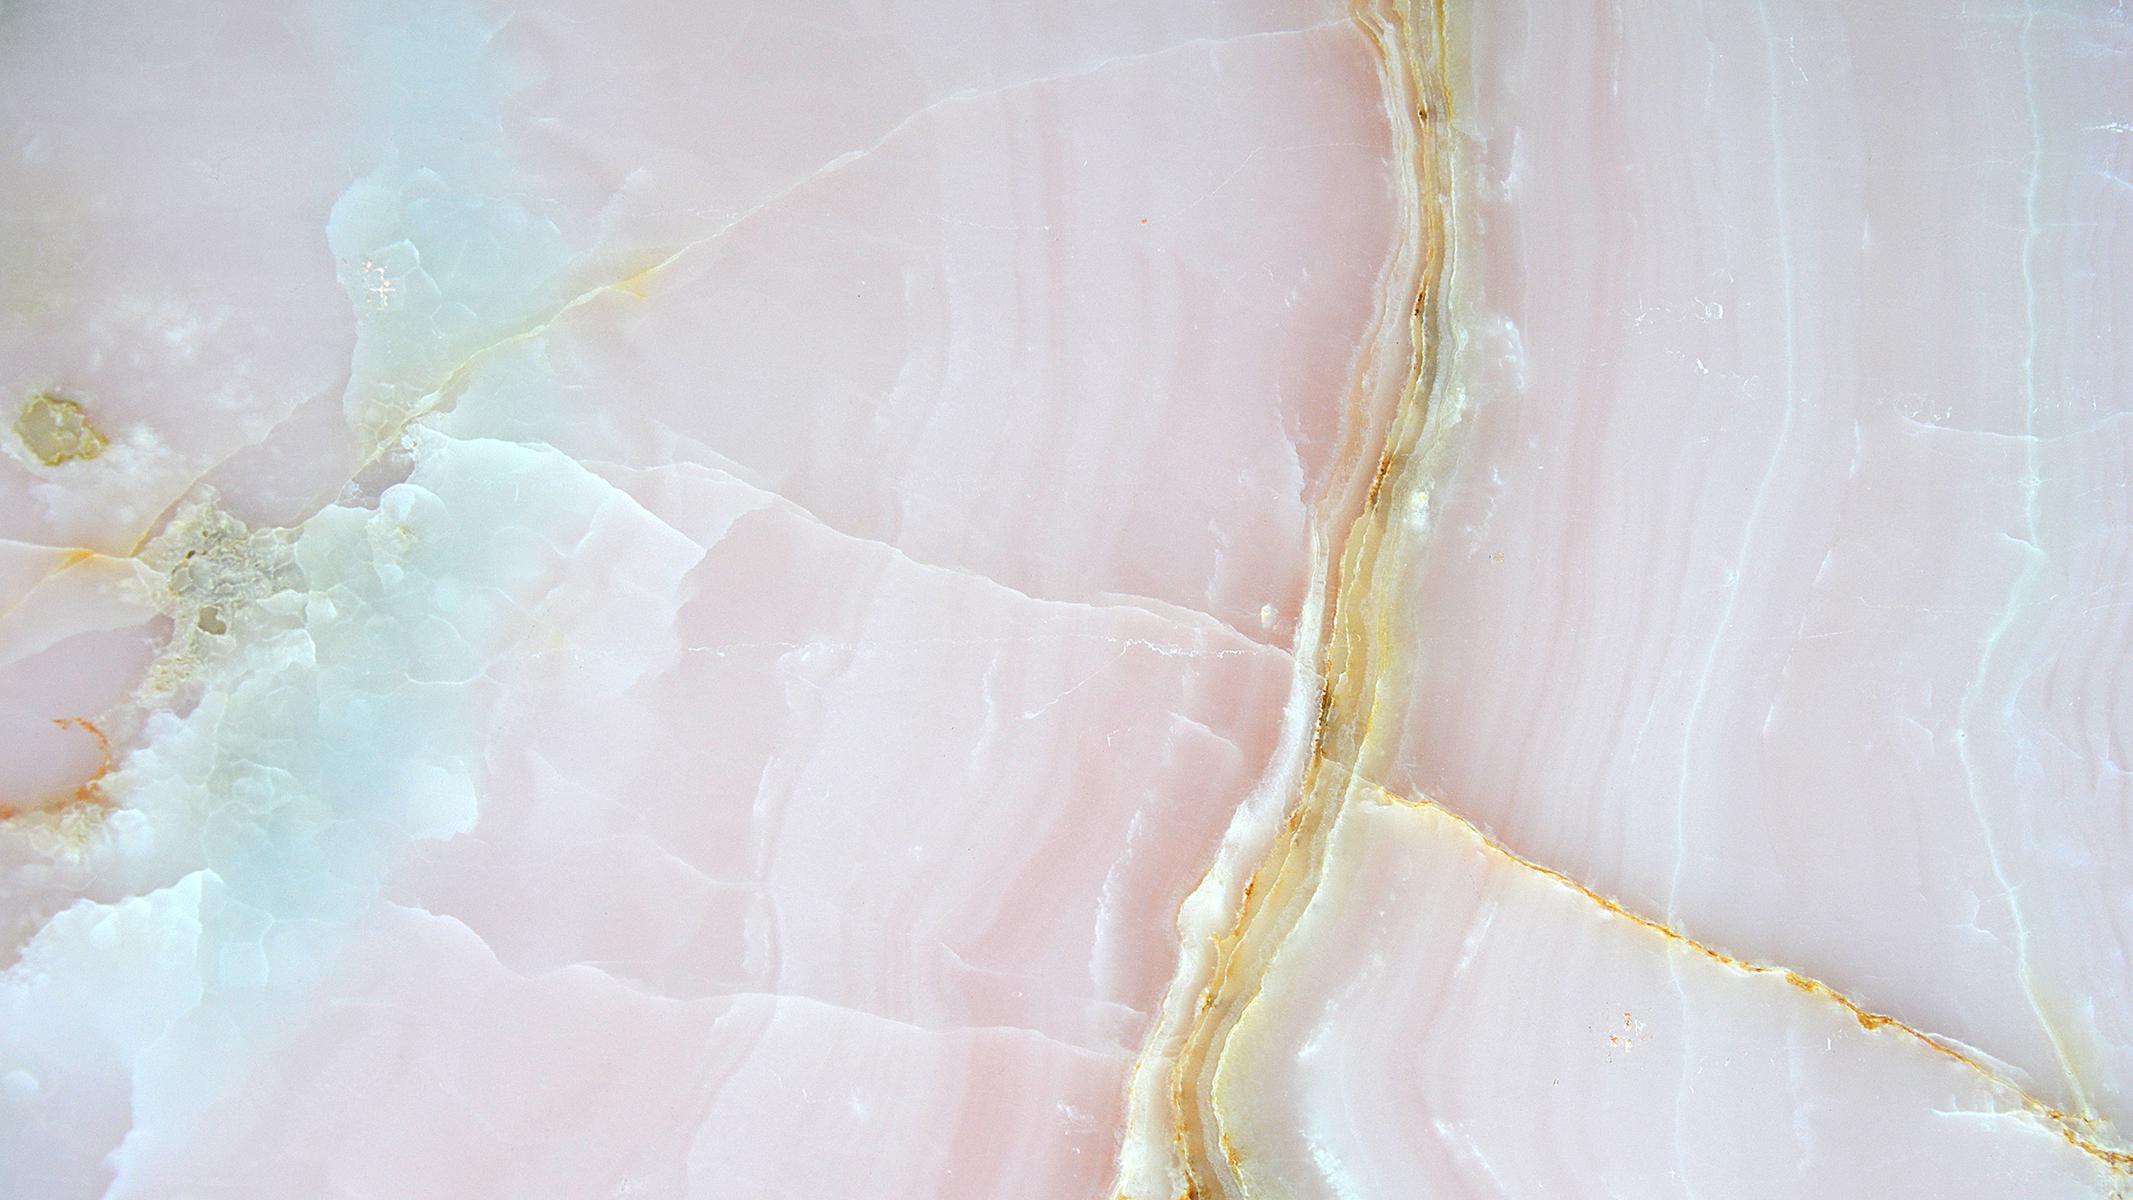 Onyx pink onyx detail